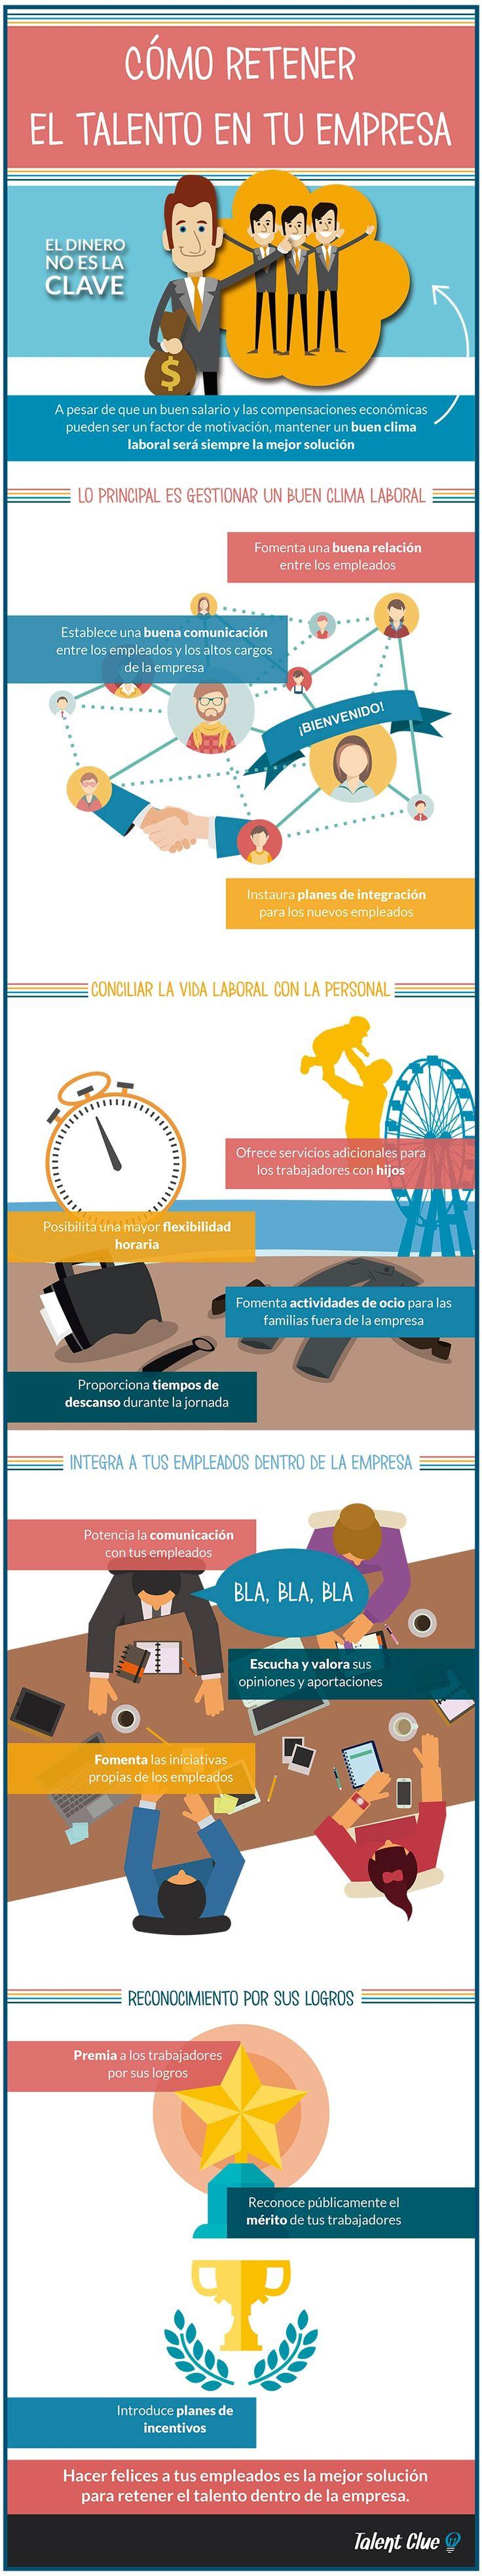 Cómo retener el talento de la empresa #infografia #infographic #RRHH